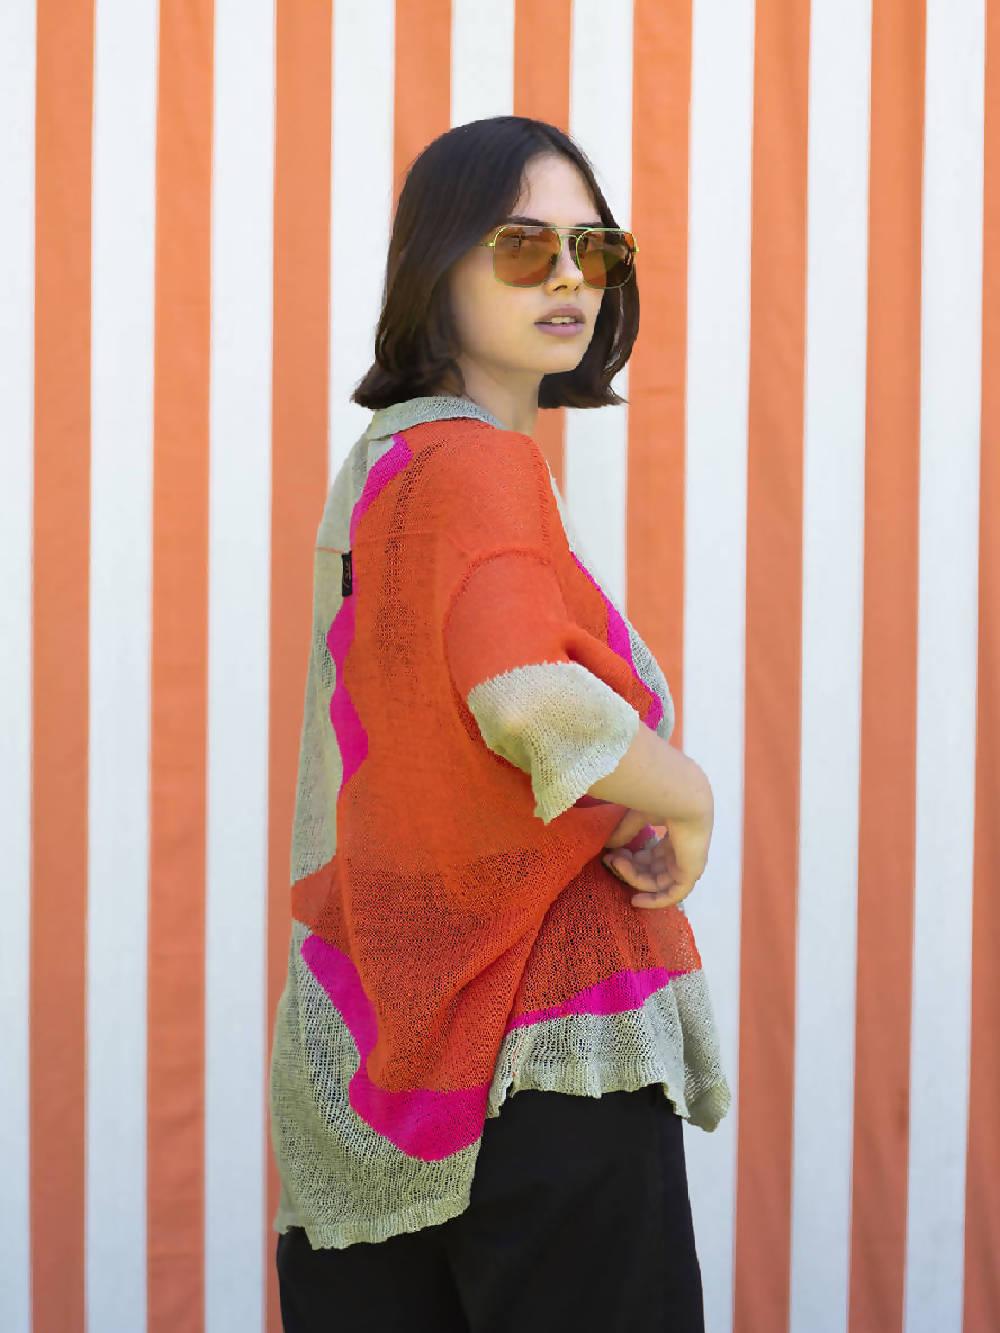 Kerriih Multicolour Sicily sunset short sleeve knit shirt